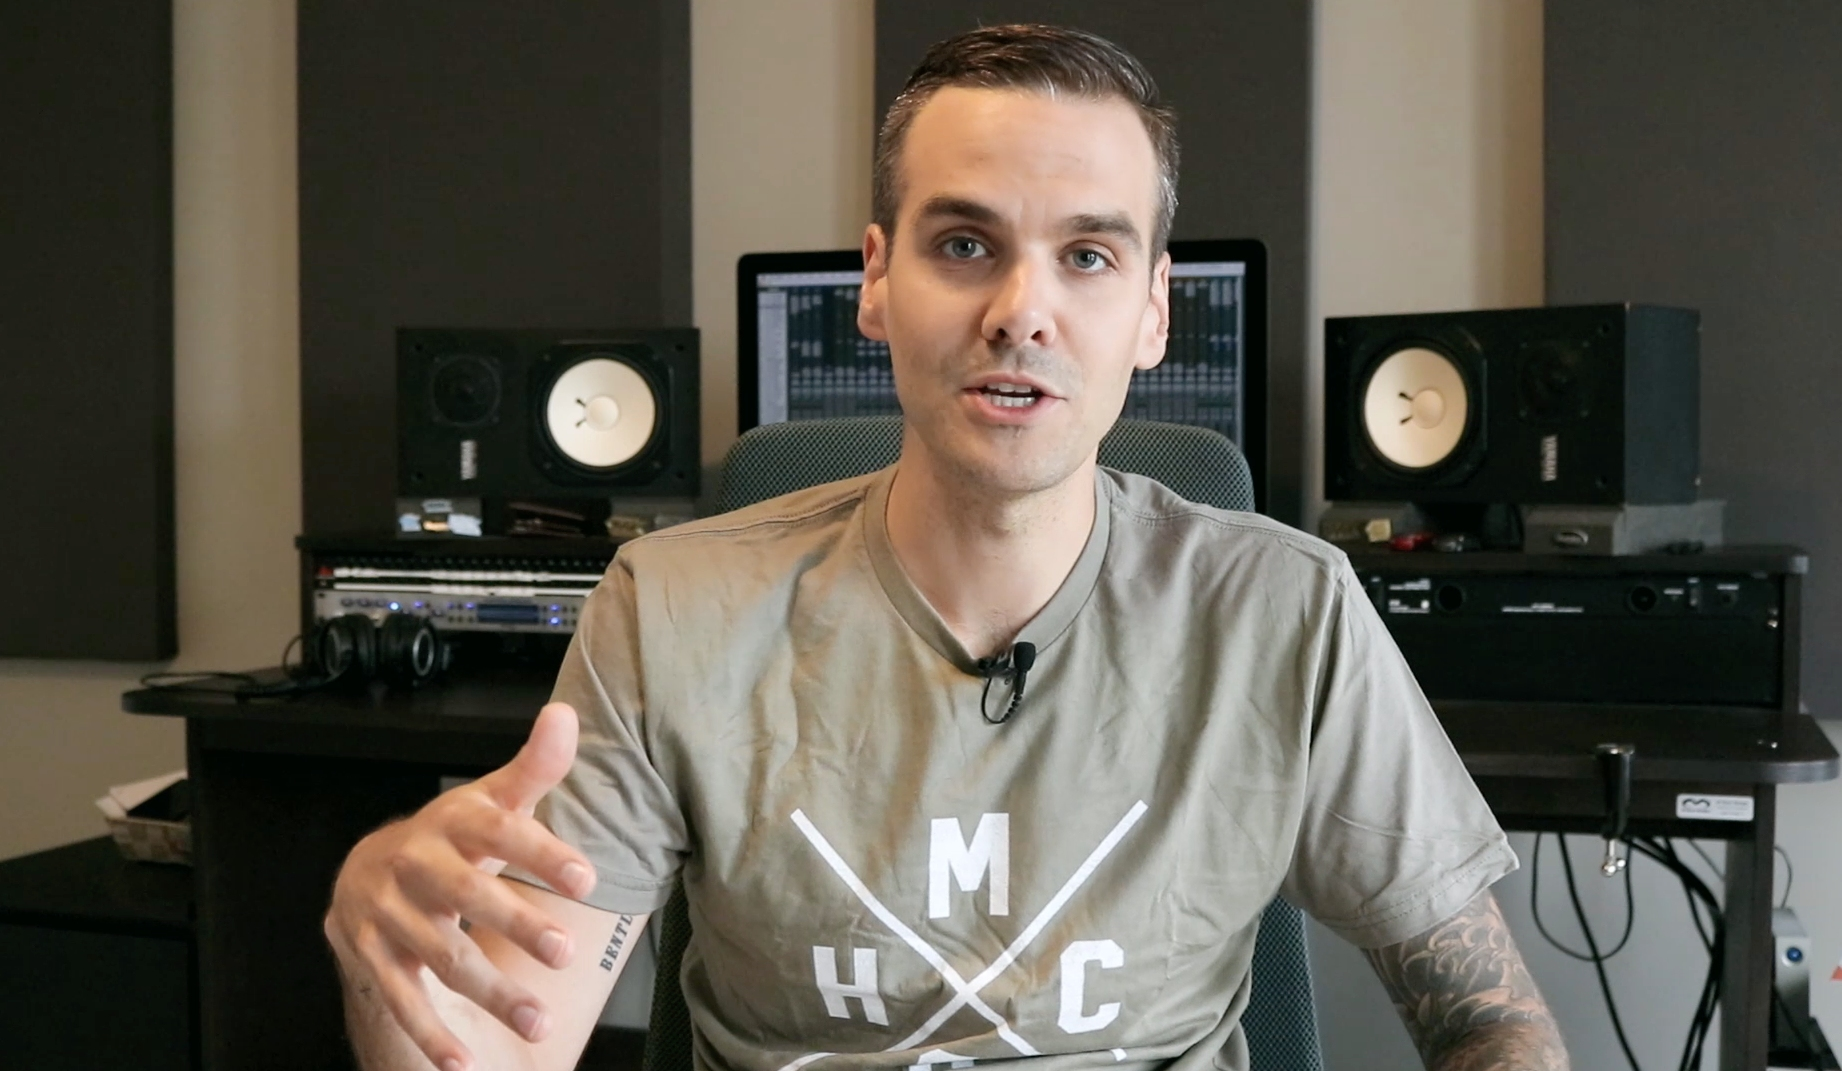 Jodran Valeriote explains mixing metal